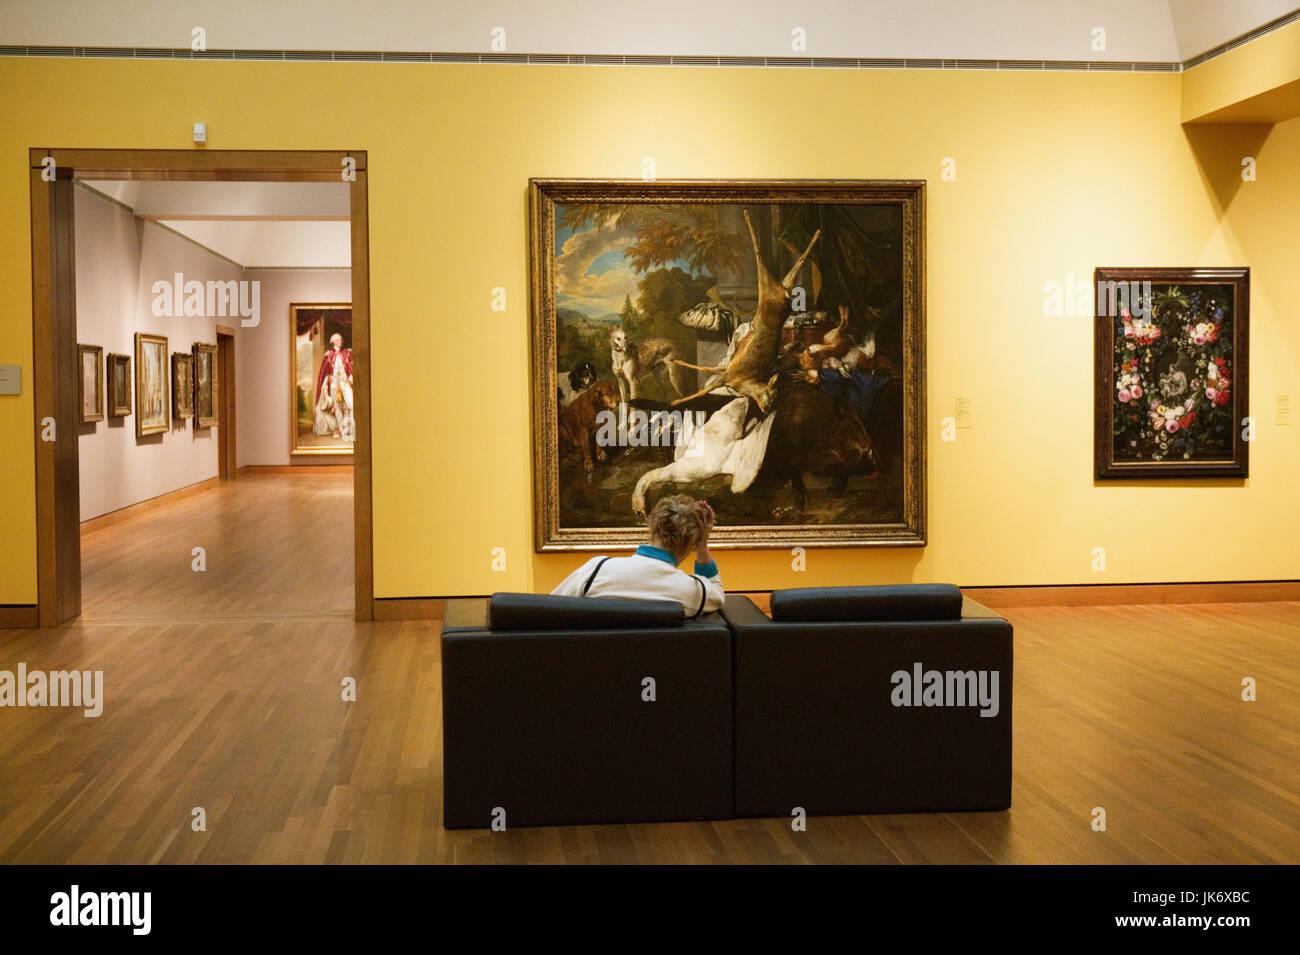 Kanada, Quebec, Montreal, Museum of Fine Art, Ausstellung, Gemälde, Besucherin kein Model release, Nordamerika, Stockbild